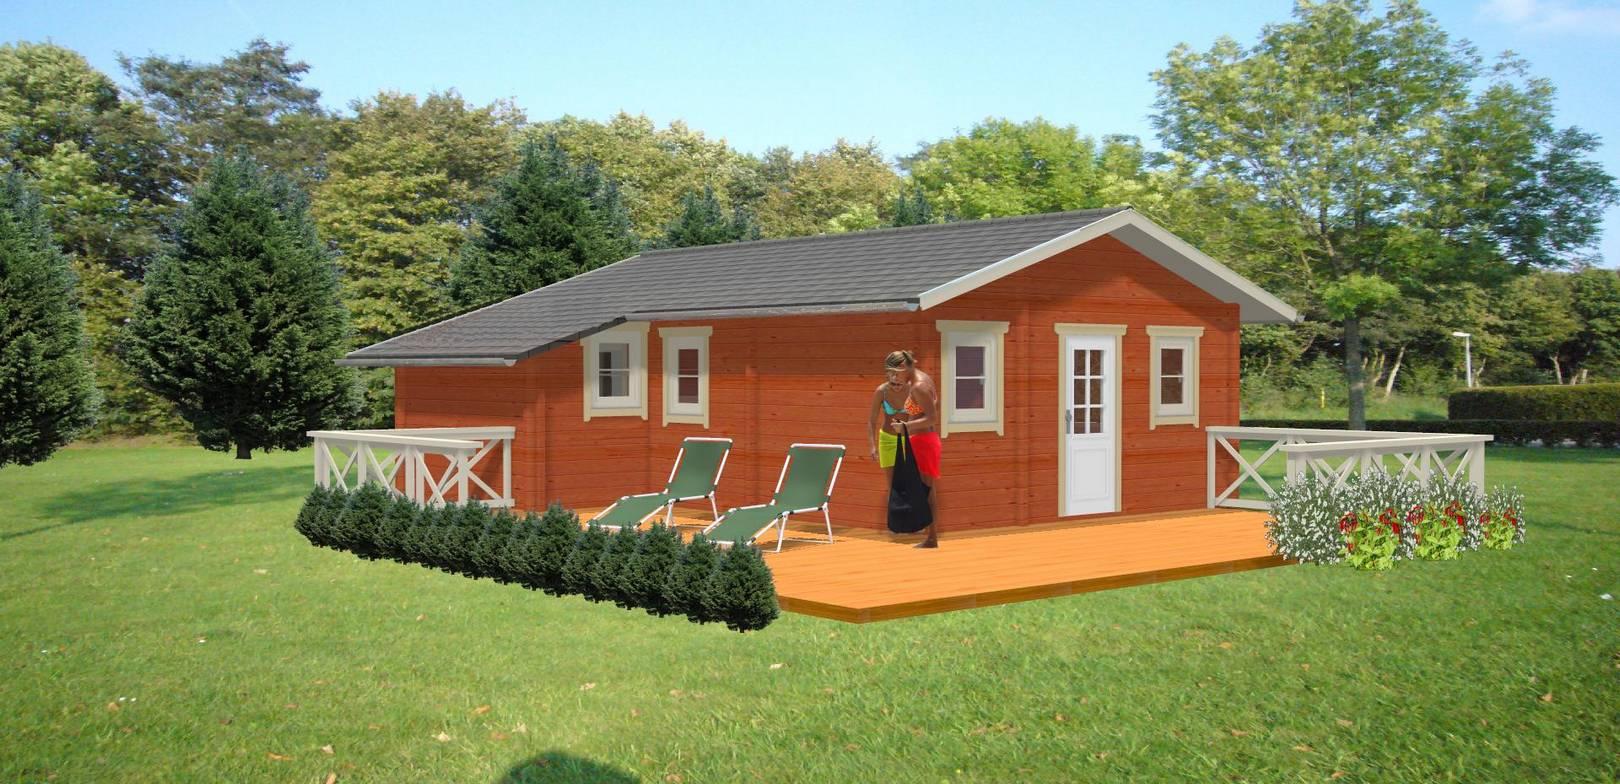 ferienhaus satu im blockhaus stil dr jeschke holzbau. Black Bedroom Furniture Sets. Home Design Ideas